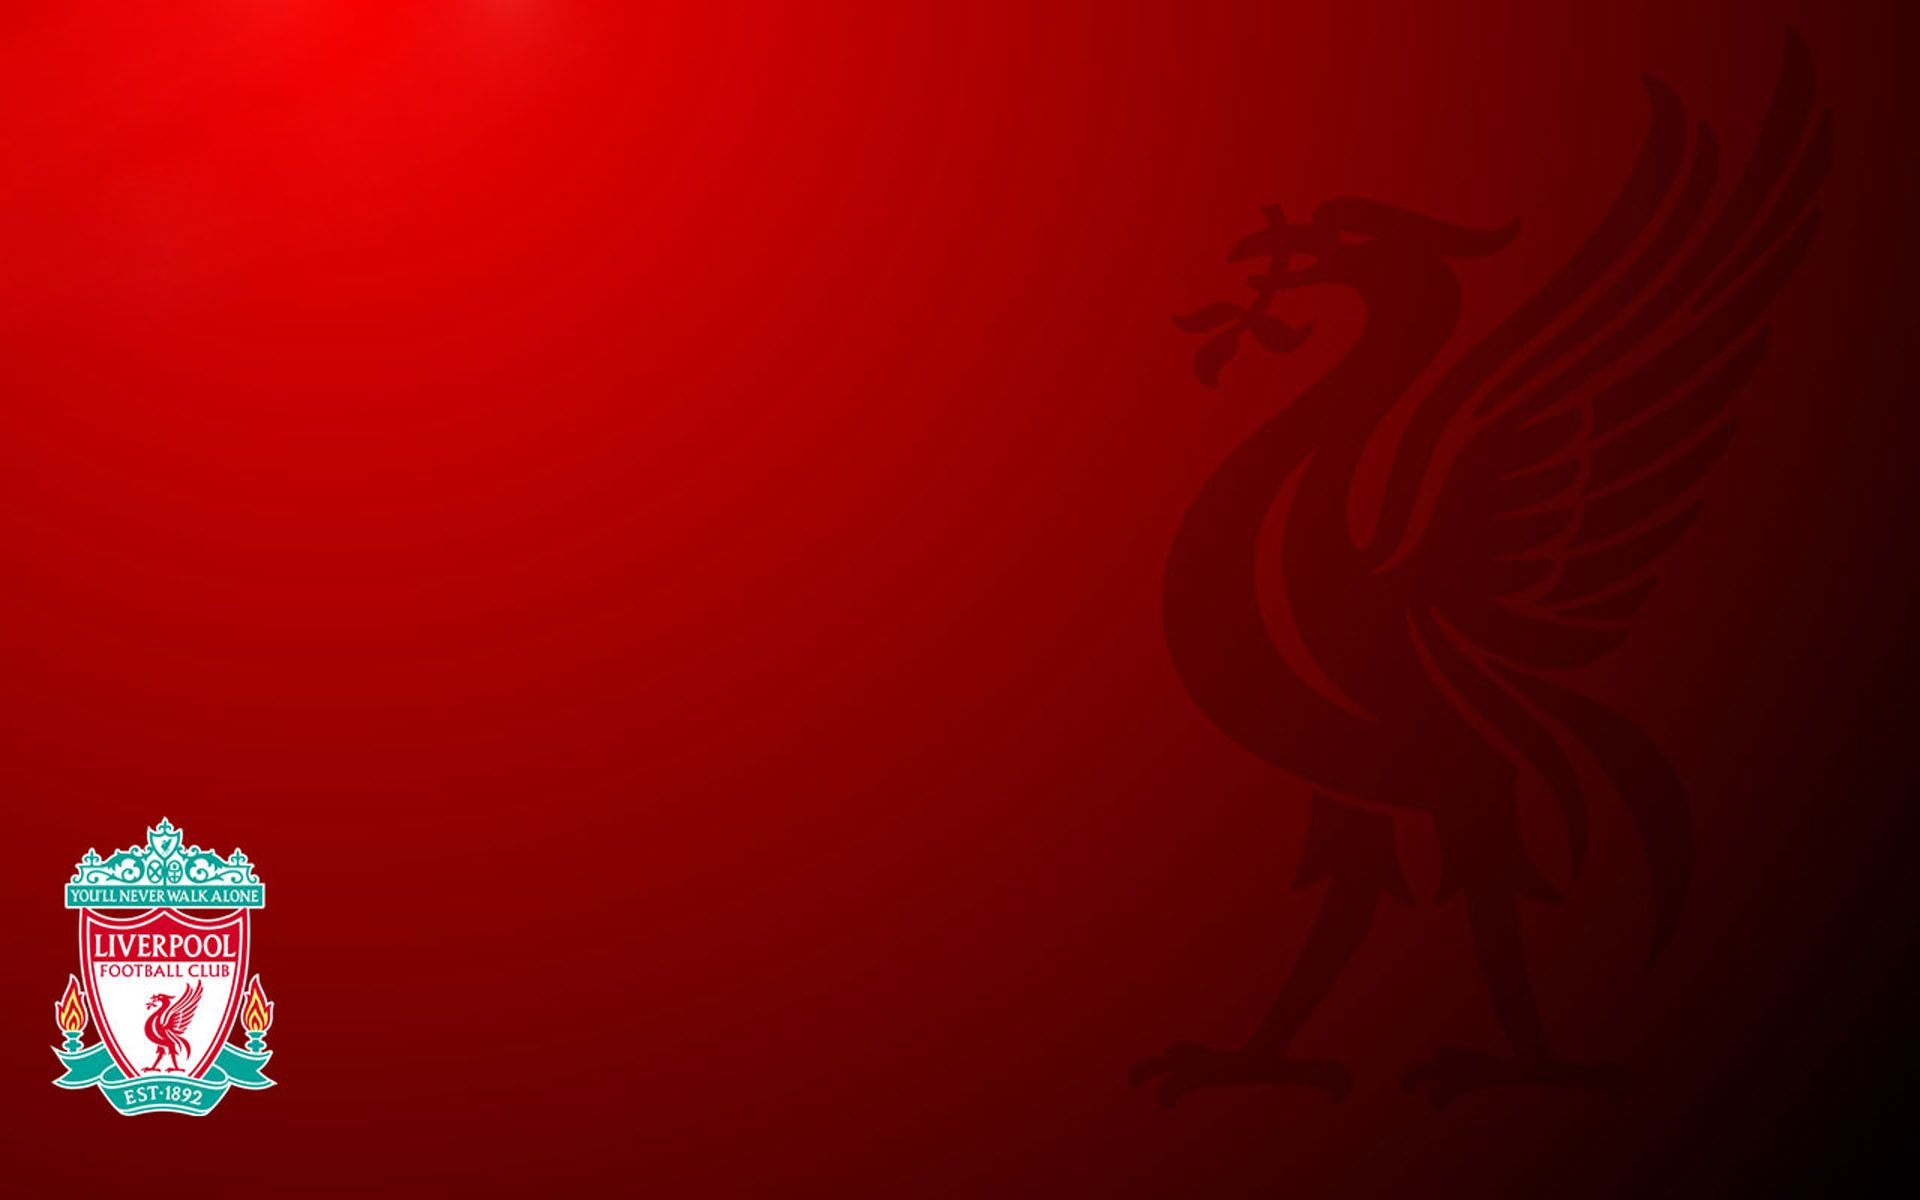 Steven Gerrard Quotes Wallpaper Hd Liverpool Wallpapers Pixelstalk Net